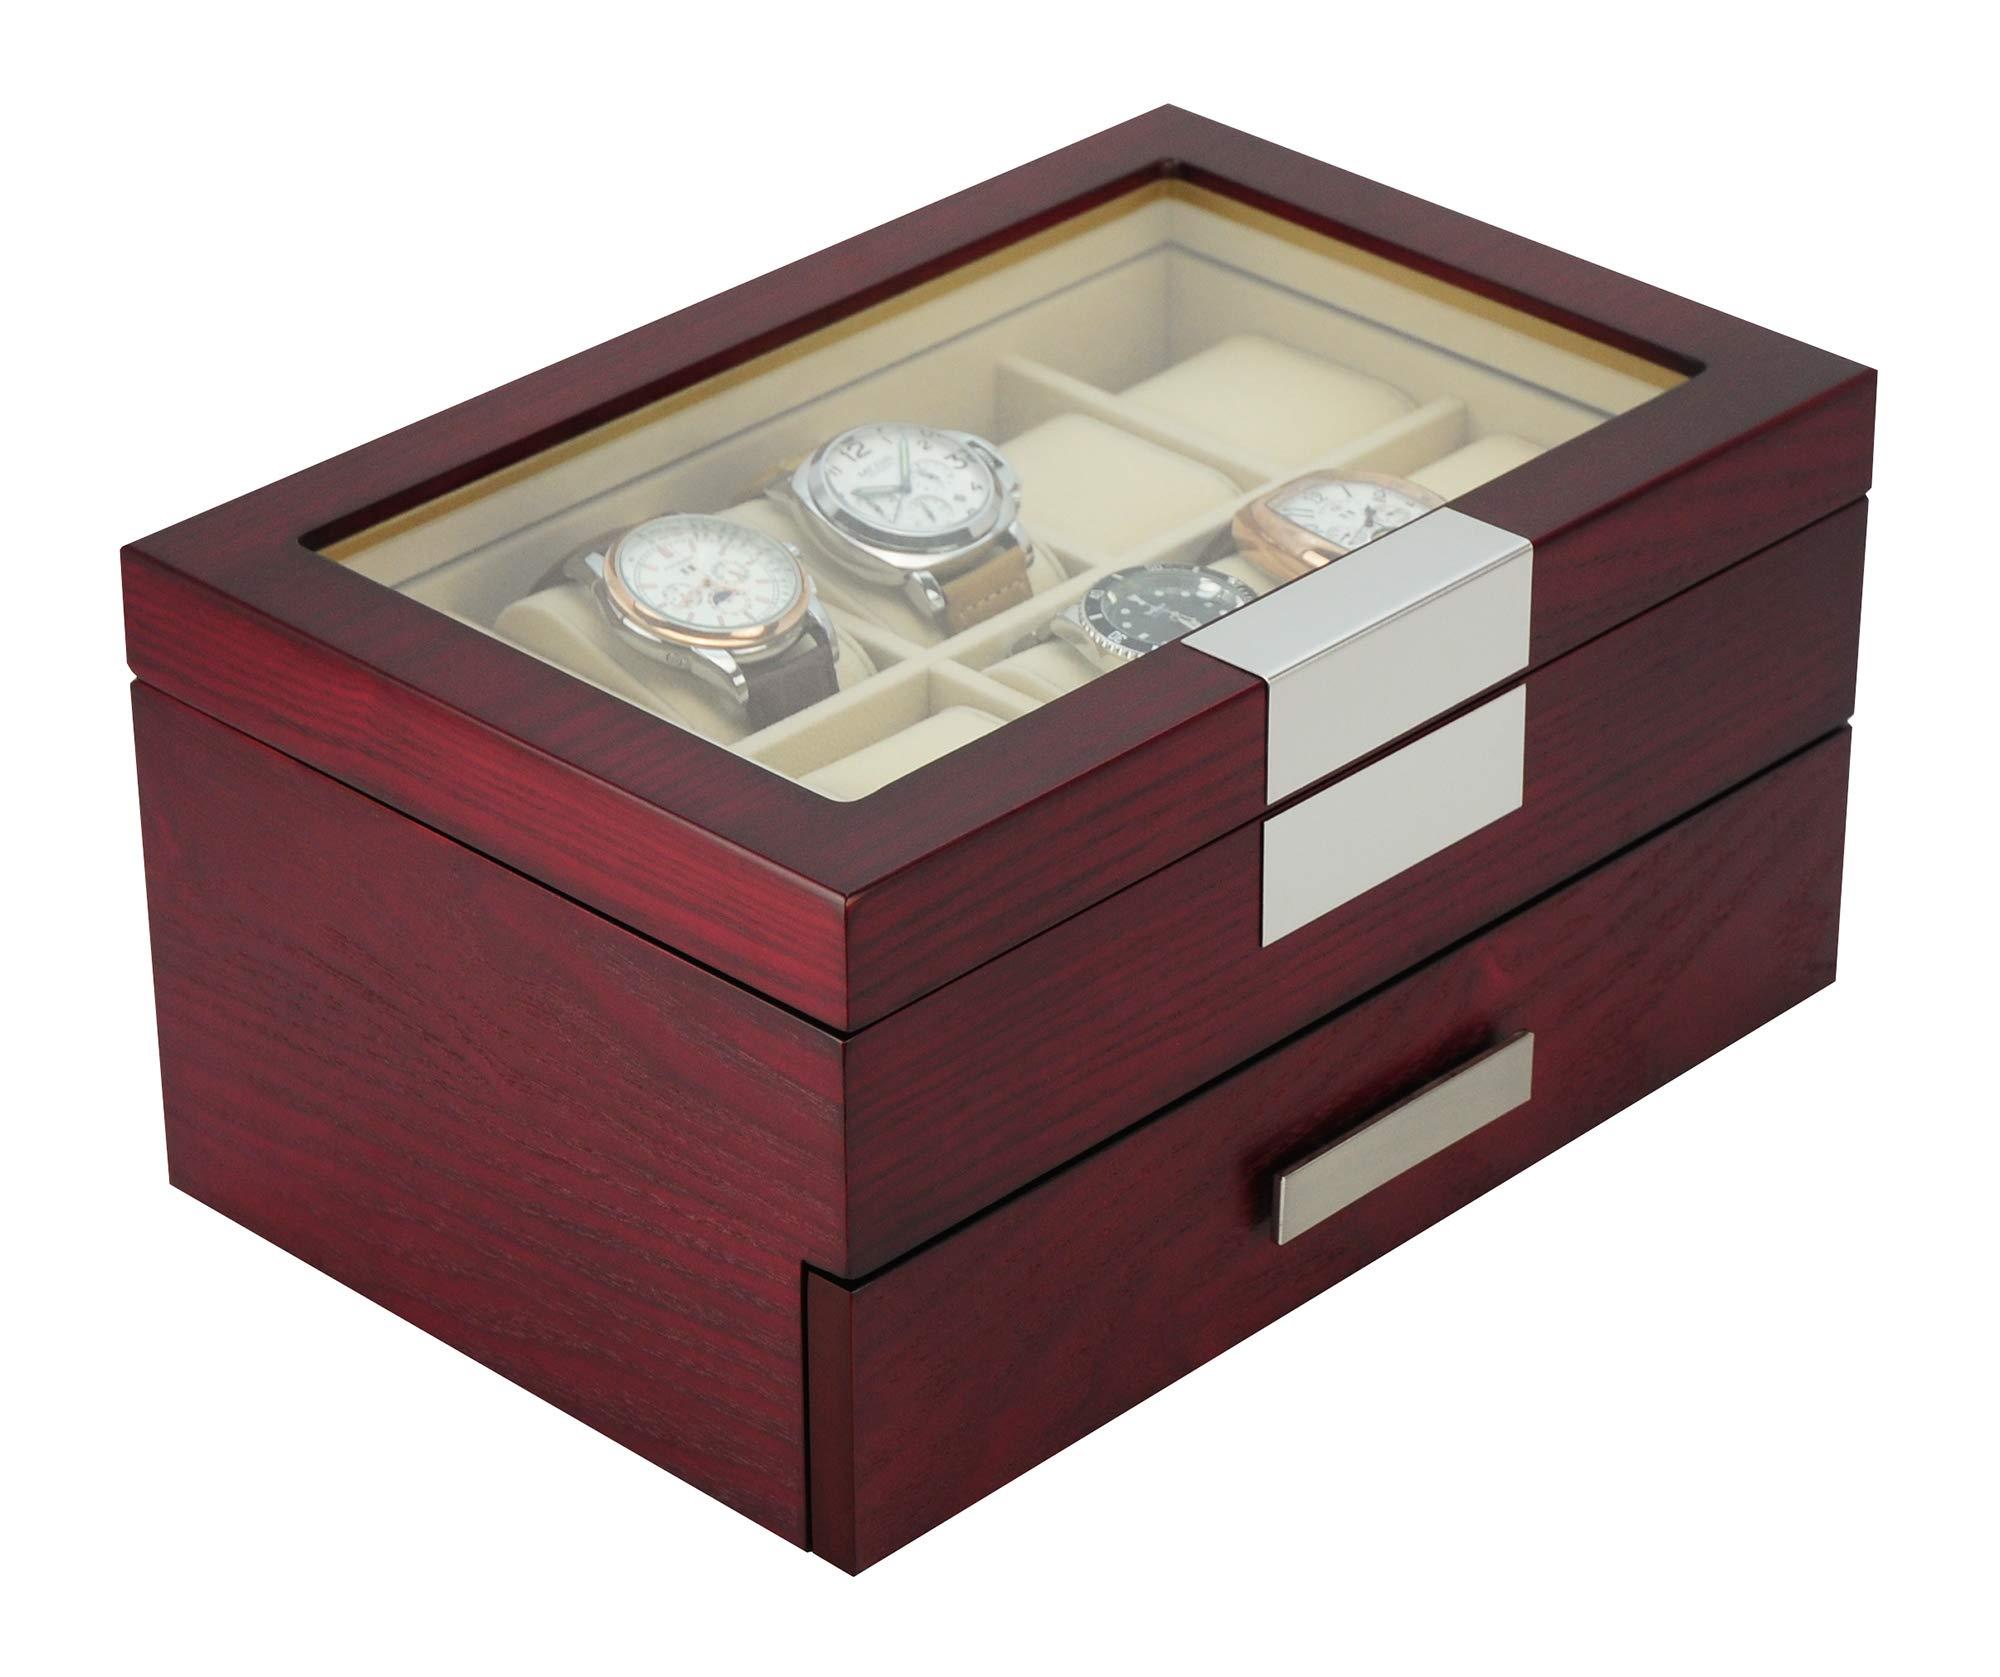 DecoreBay Executive Jewelry Storage Darling